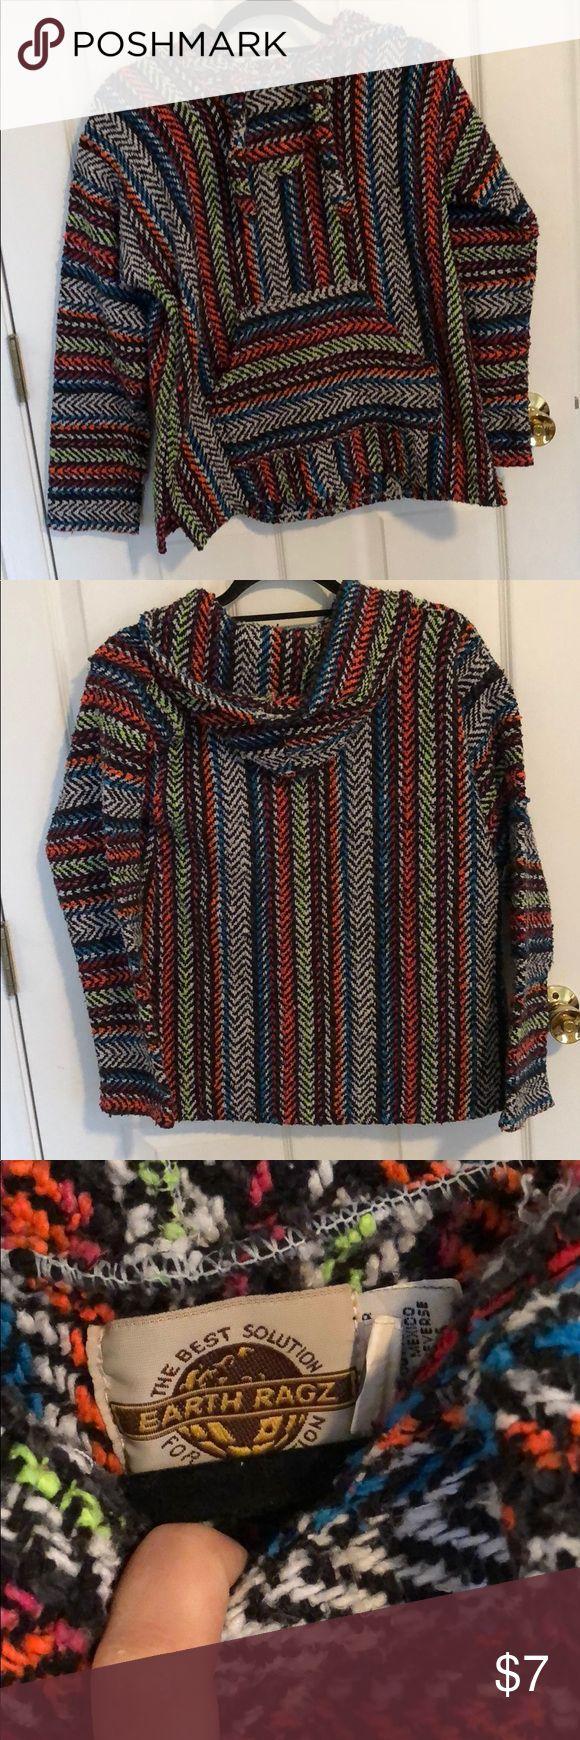 Colorful drug rug Never worn earth ragz Tops Sweatshirts & Hoodies